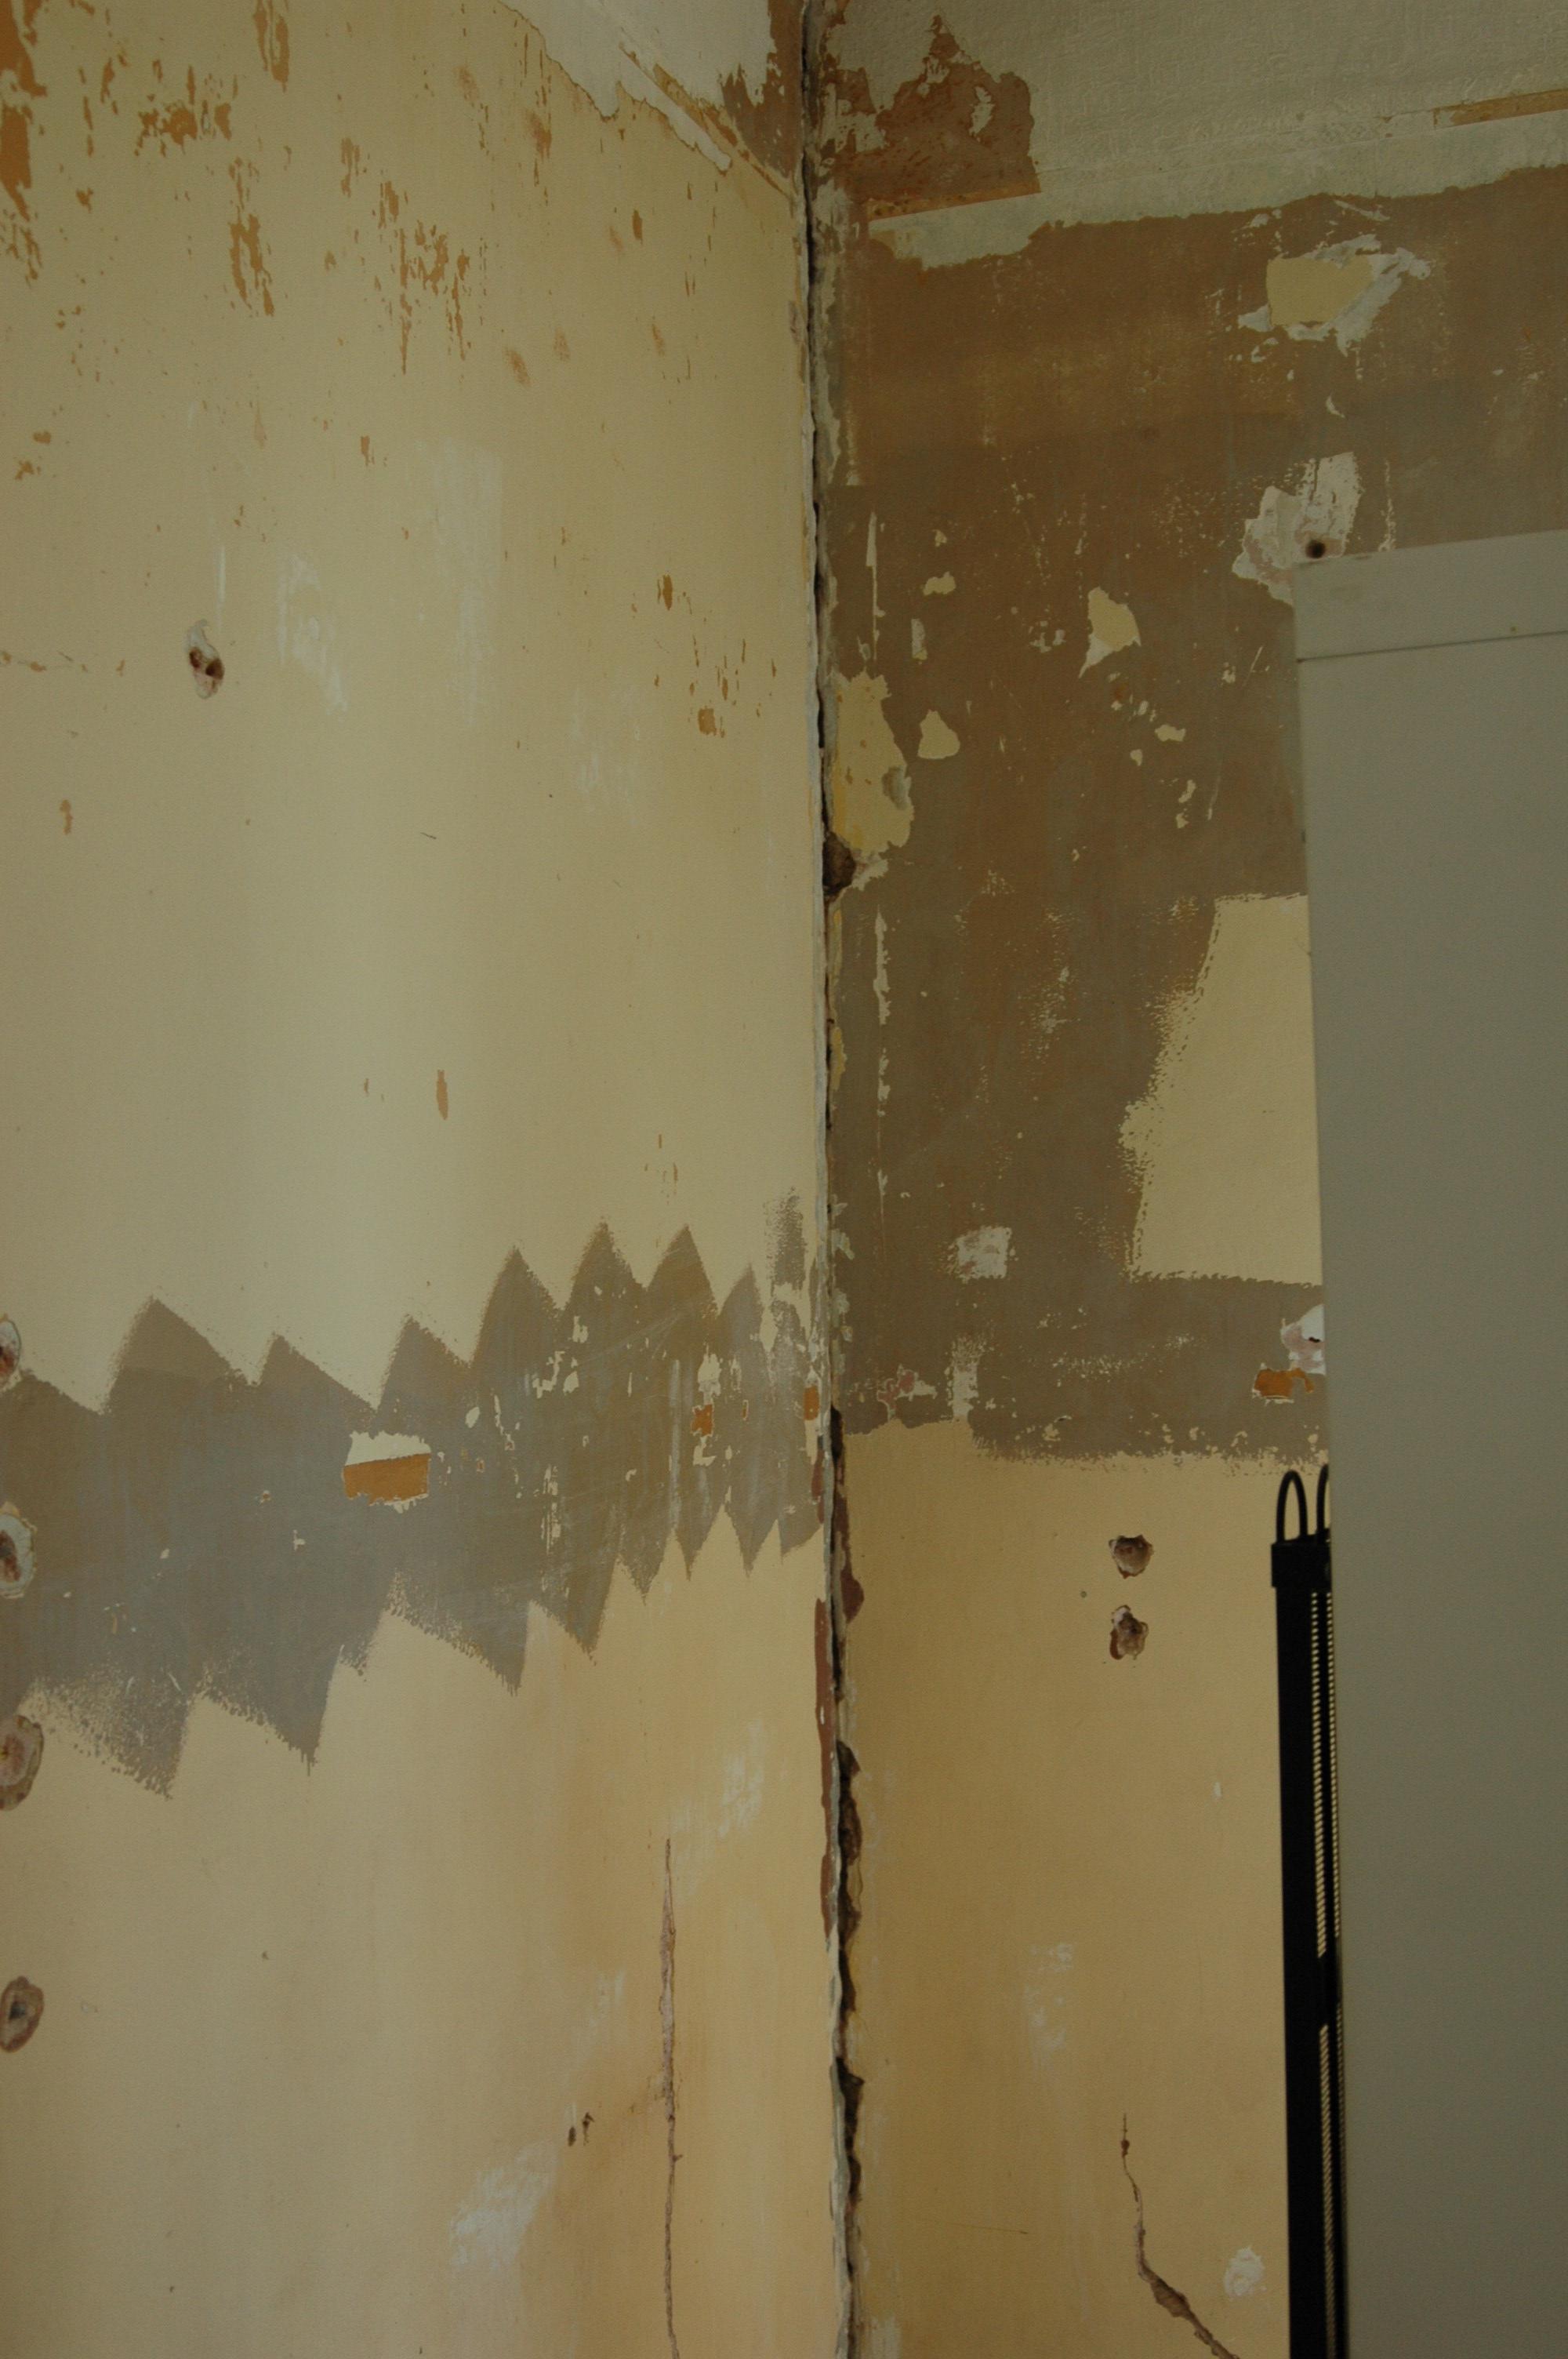 tres grosse fissure angle mur. Black Bedroom Furniture Sets. Home Design Ideas